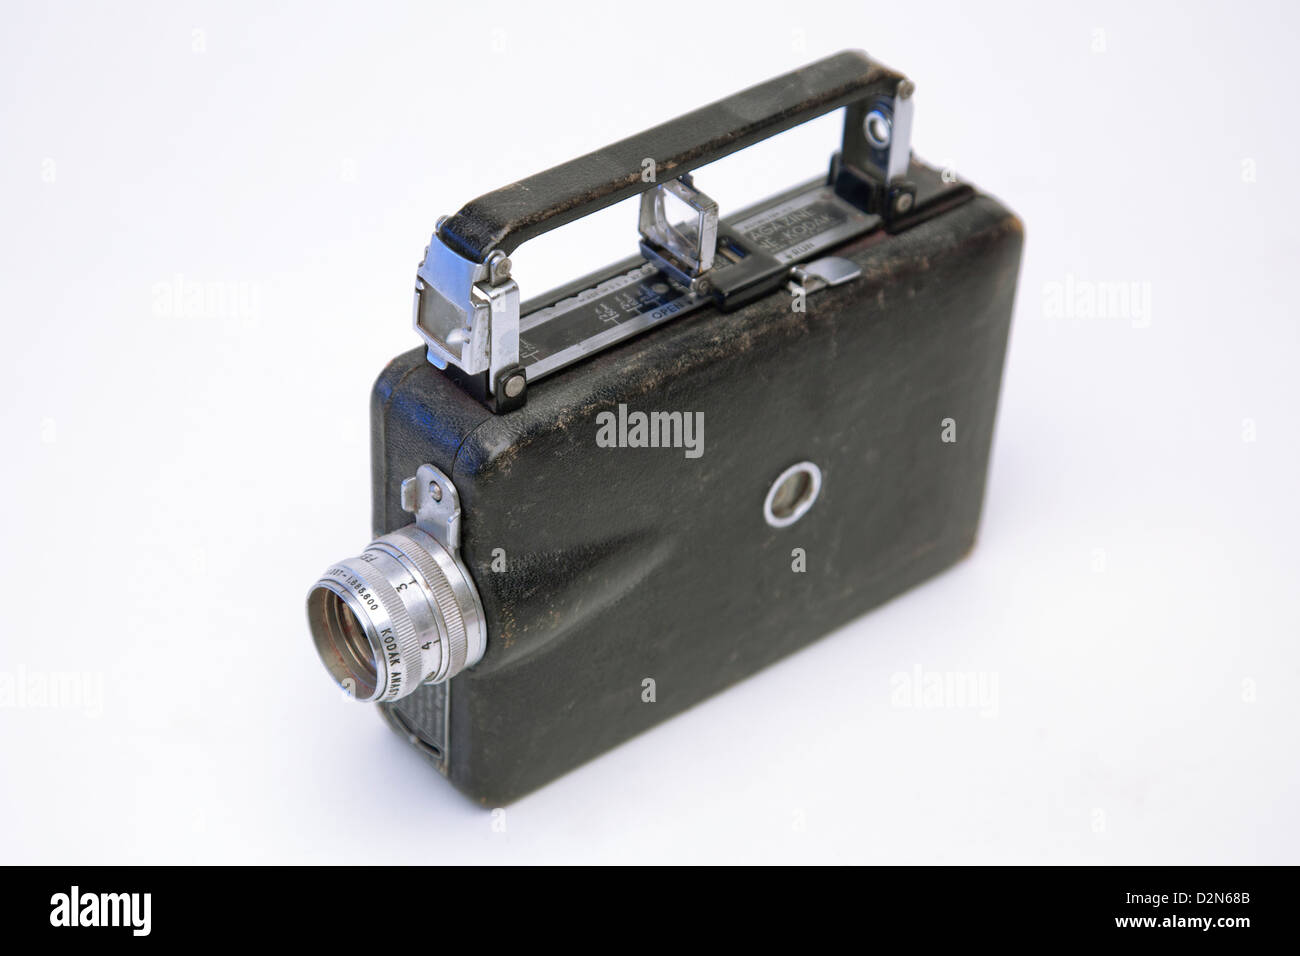 Foto de estudio de una Vendimia Eastman Kodak Revista cámara de cine Imagen De Stock